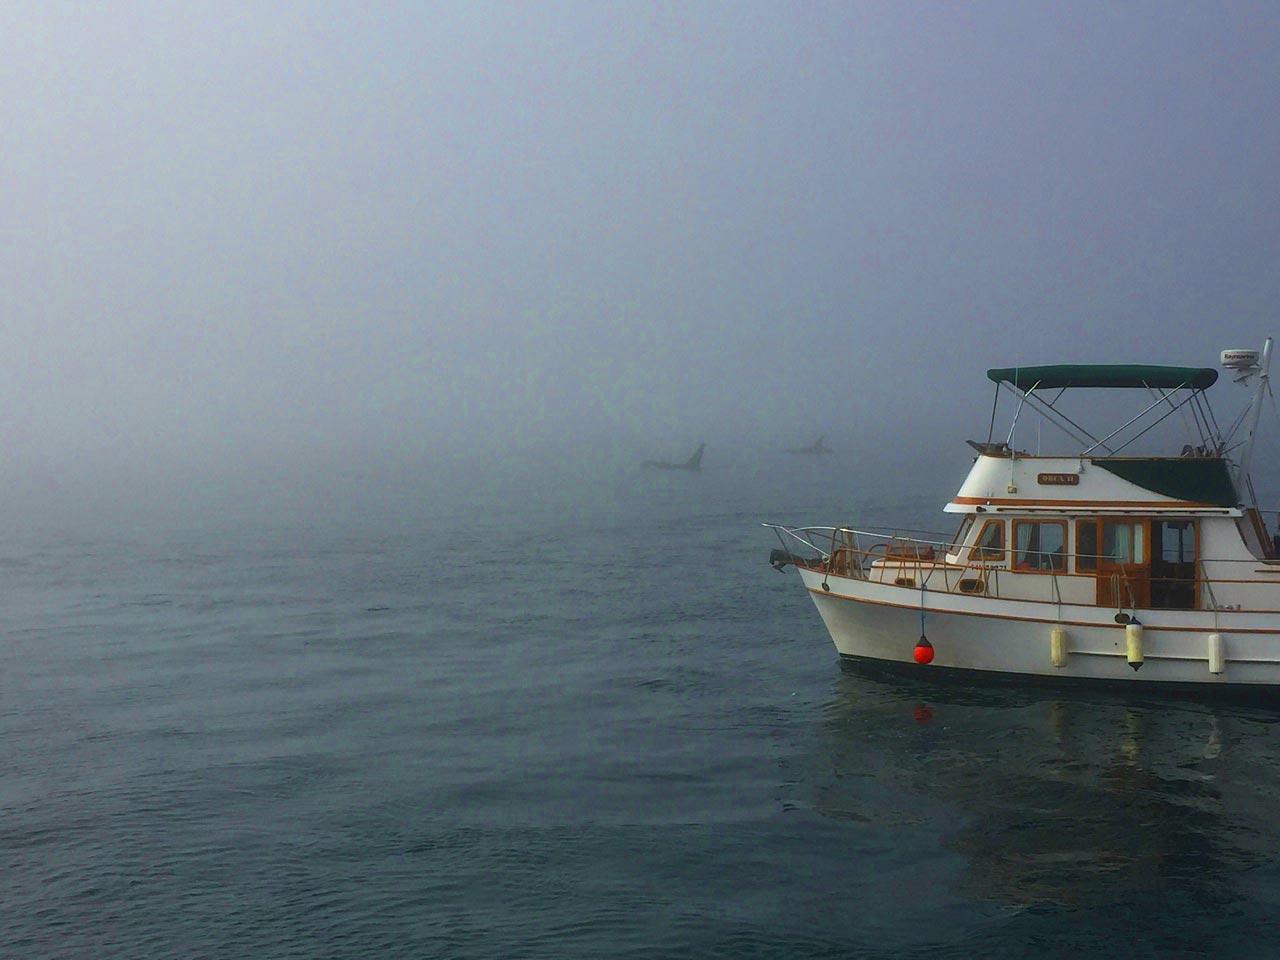 Killer whales in Blackstone Strait